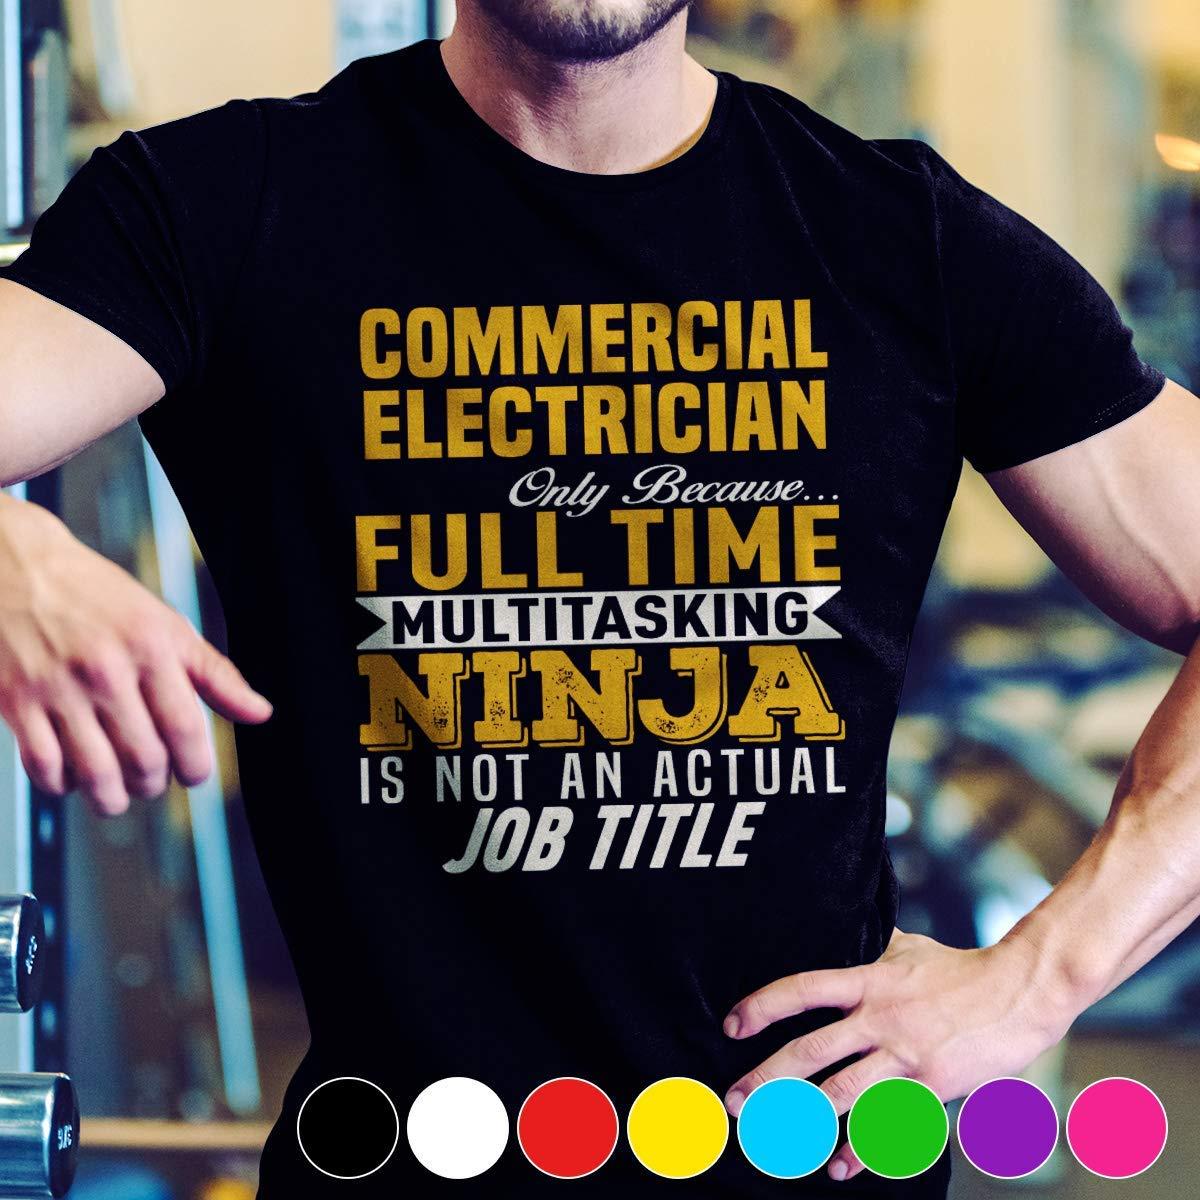 Electrician Commercial Electrician Fulltime Ninja Job Title Cool Tshirt T Shirt